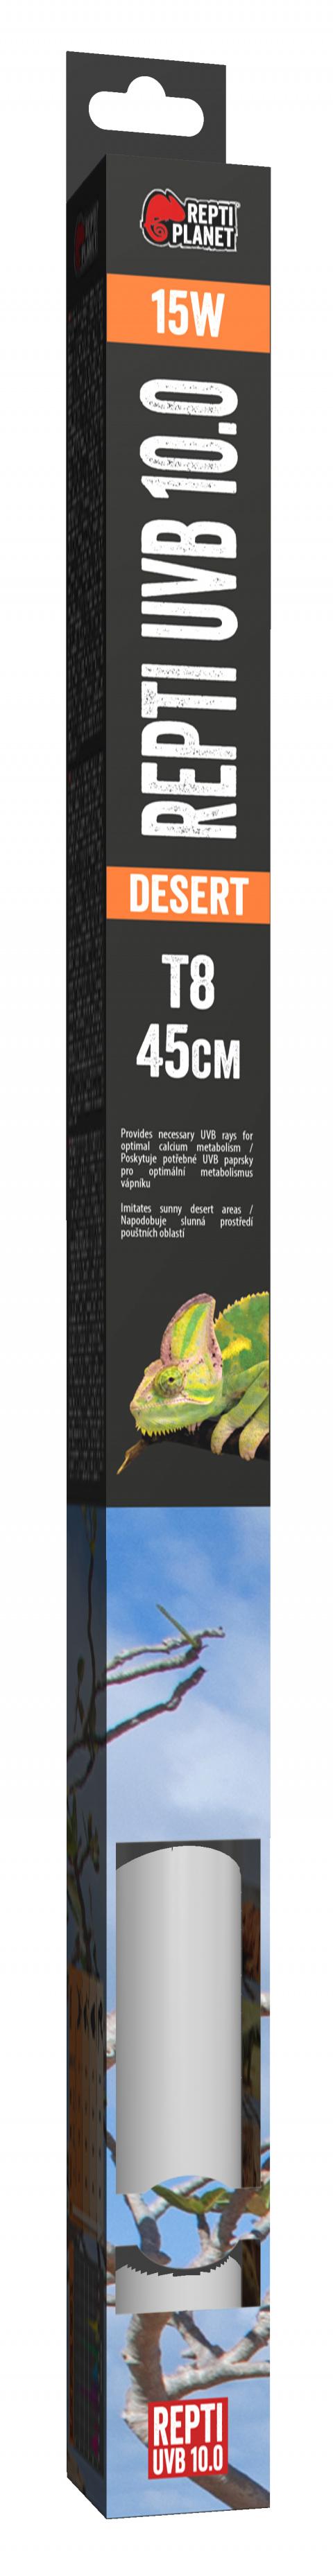 Spuldze terārija lampai - ReptiPlanet Repti T8 UVB 10.0 15W, 45 cm